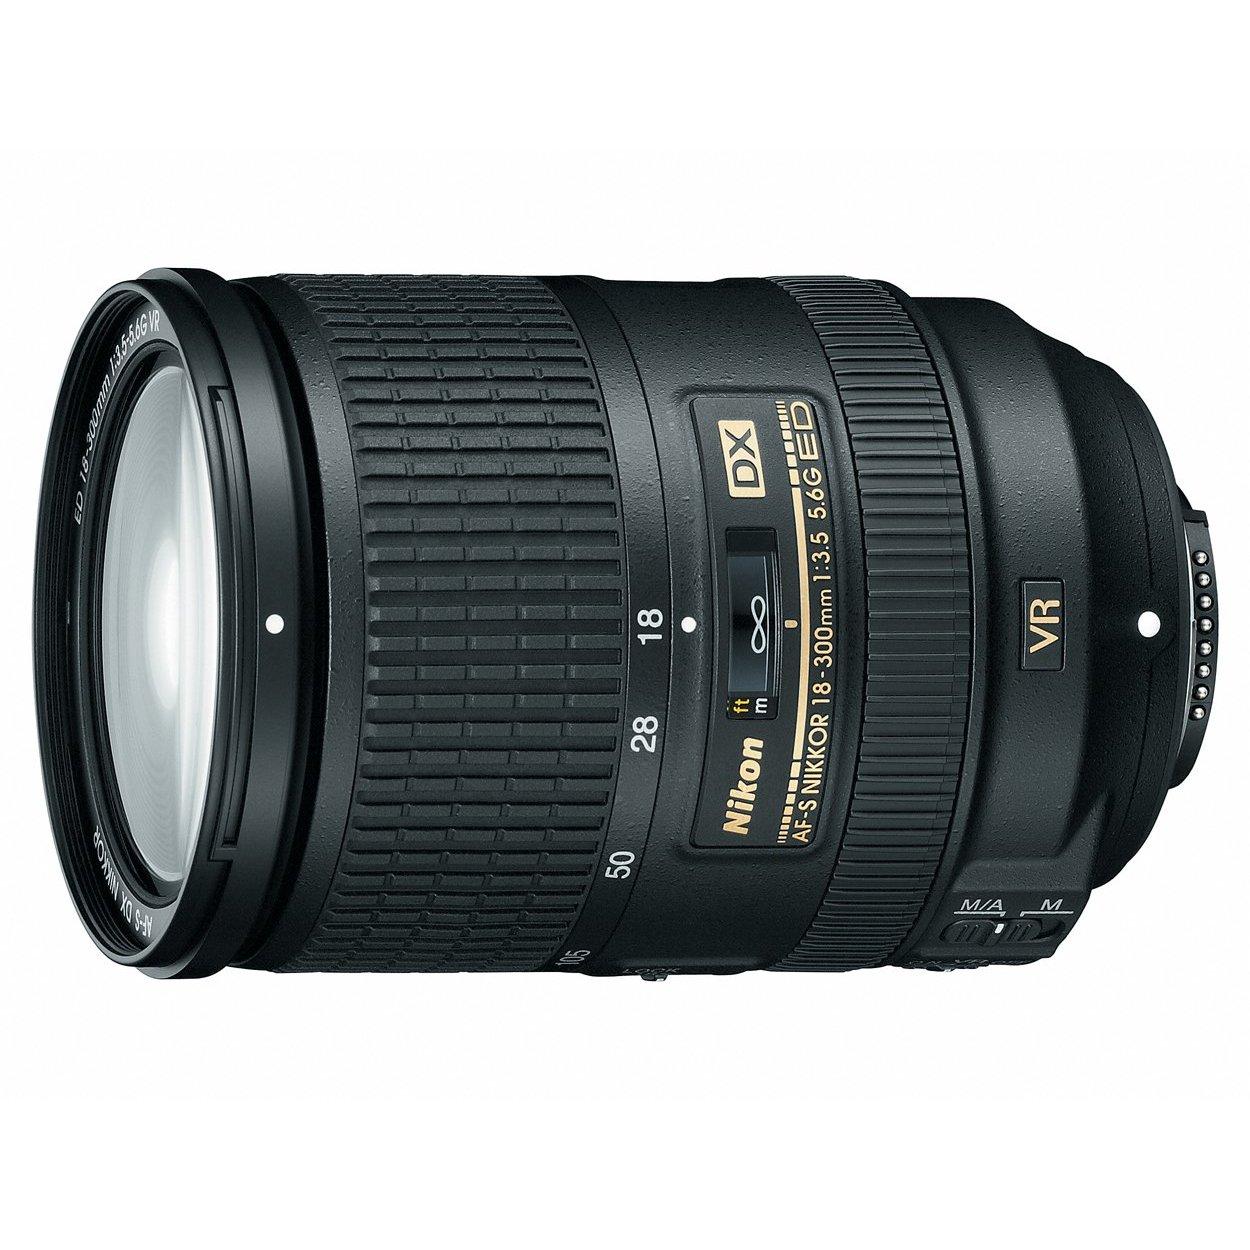 http://thetechjournal.com/wp-content/uploads/images/1206/1339855216-nikon-brings-18300mm-nikkor-zoom-lens-for-dslr-cameras-1.jpg